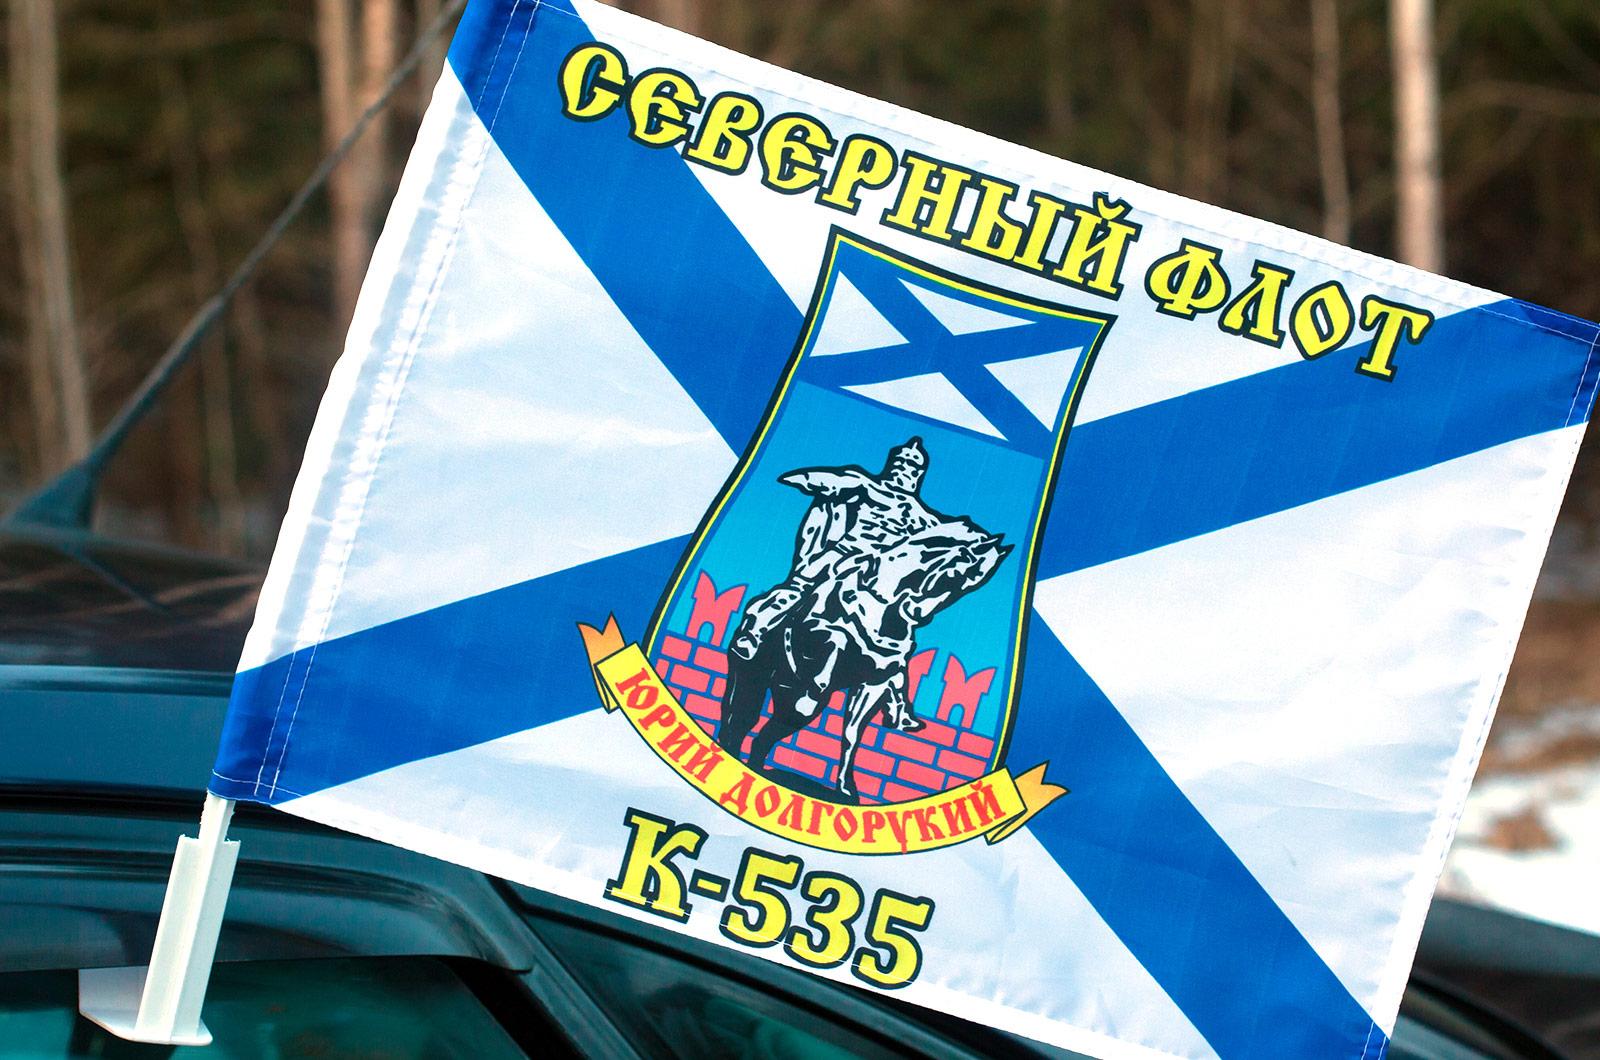 Флаг на машину с кронштейном К-535 «Юрий Долгорукий»